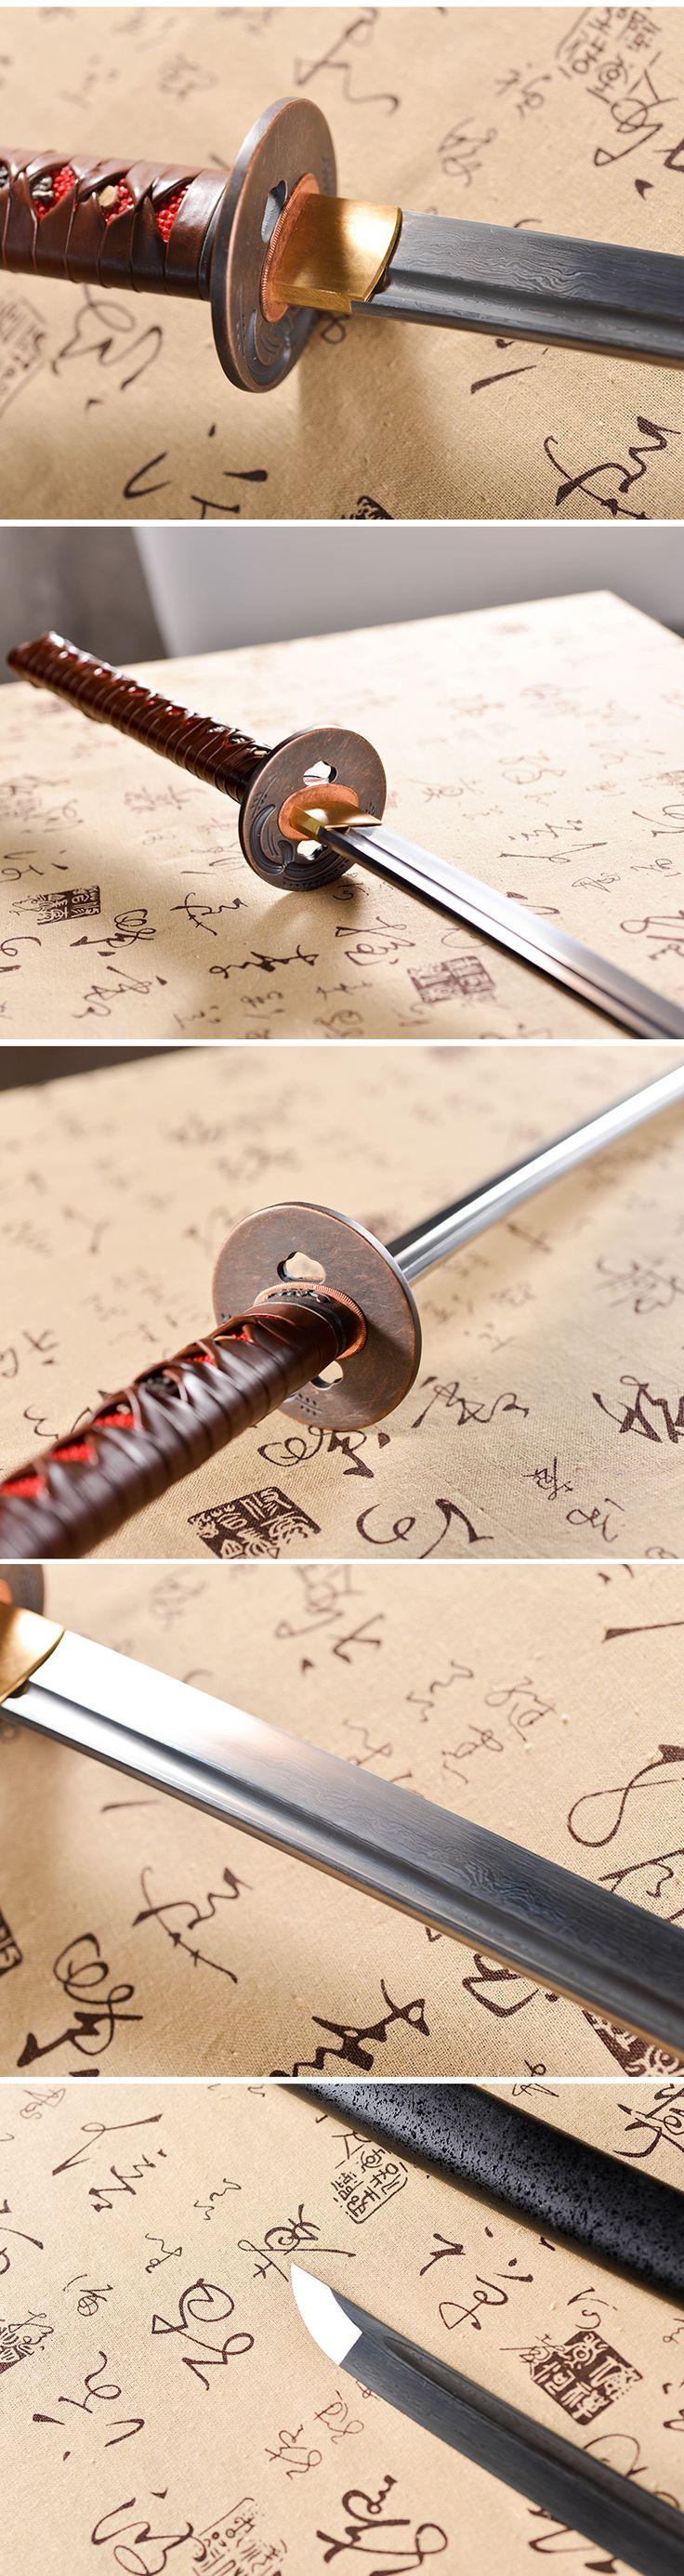 hand forged full tang damascus steel blade Katana